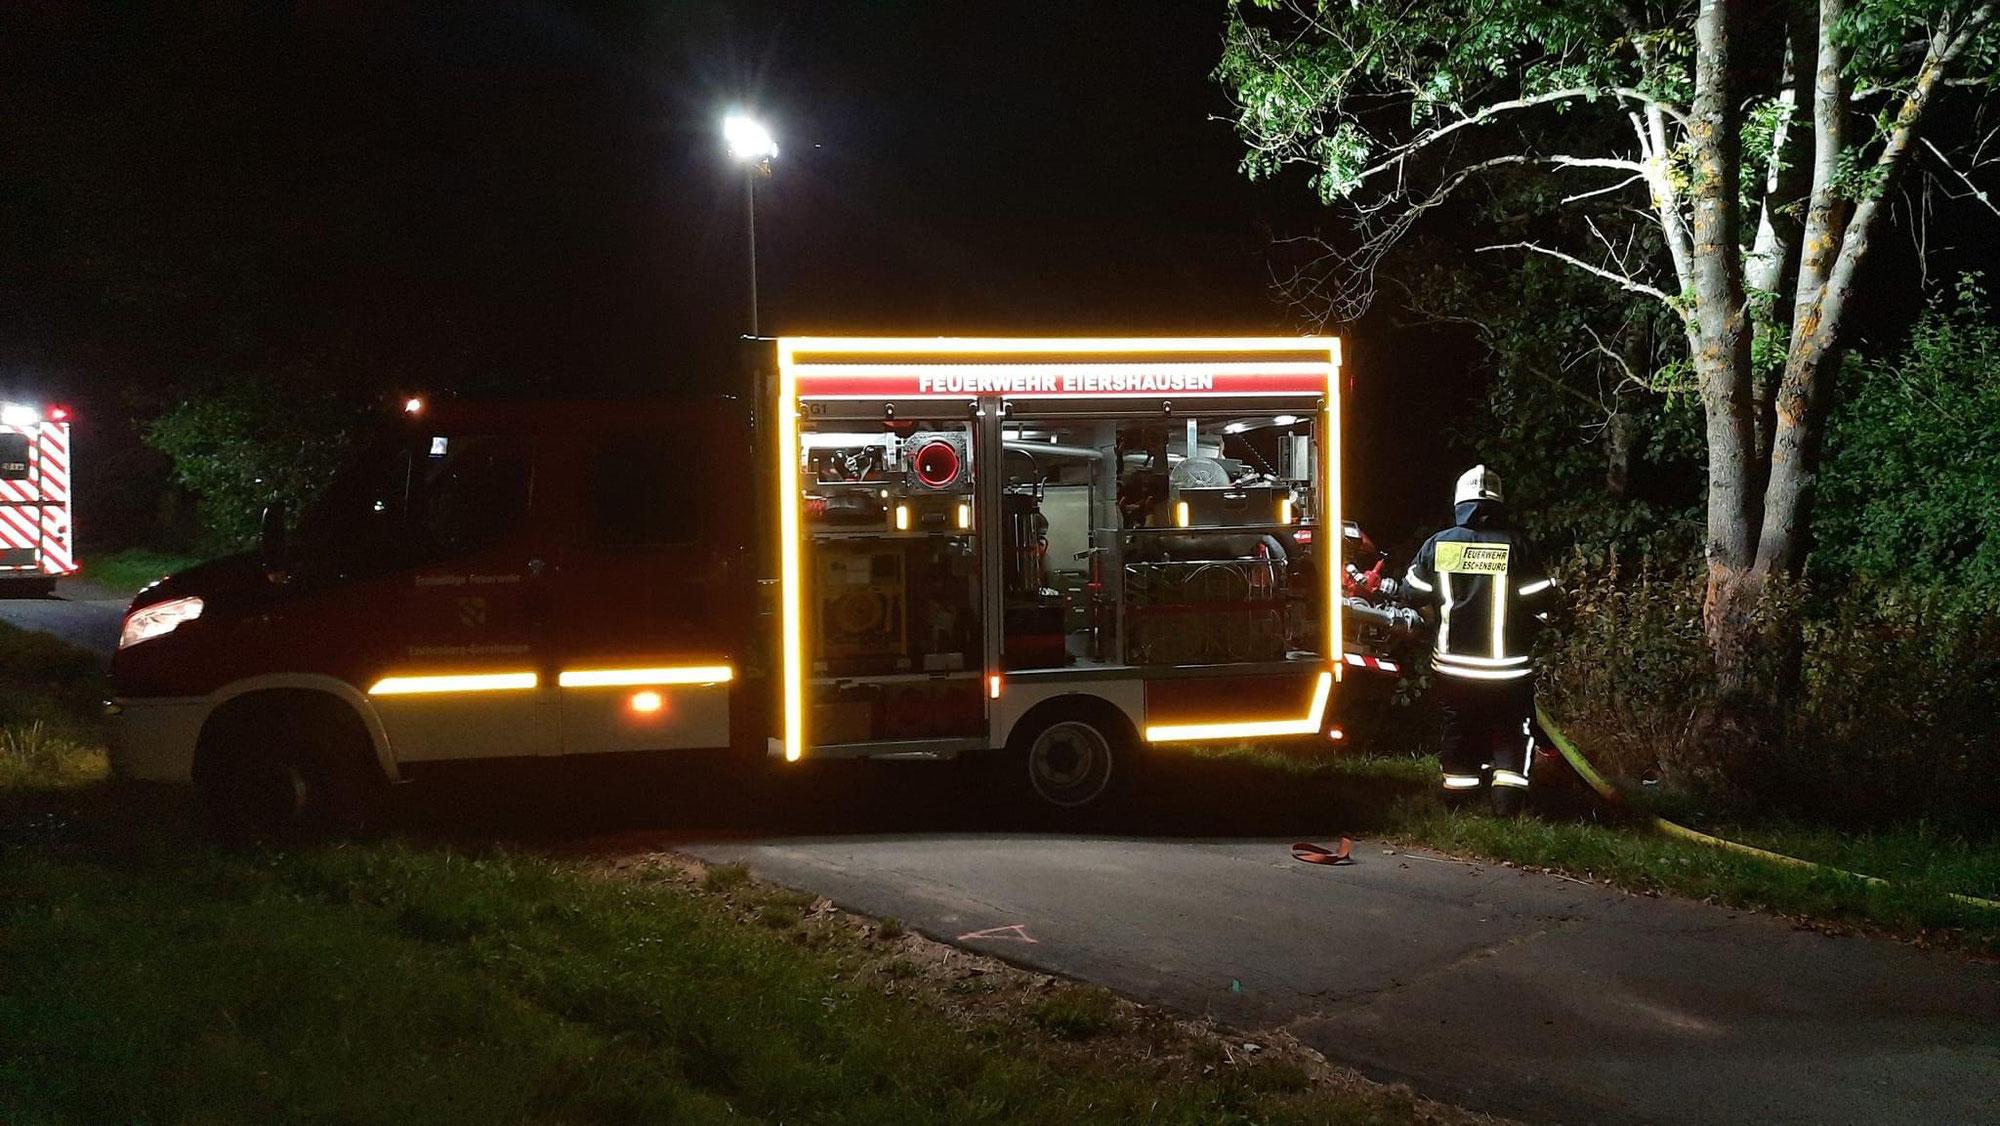 Feuer 1 - Flächenbrand Heuballen in Eiershausen